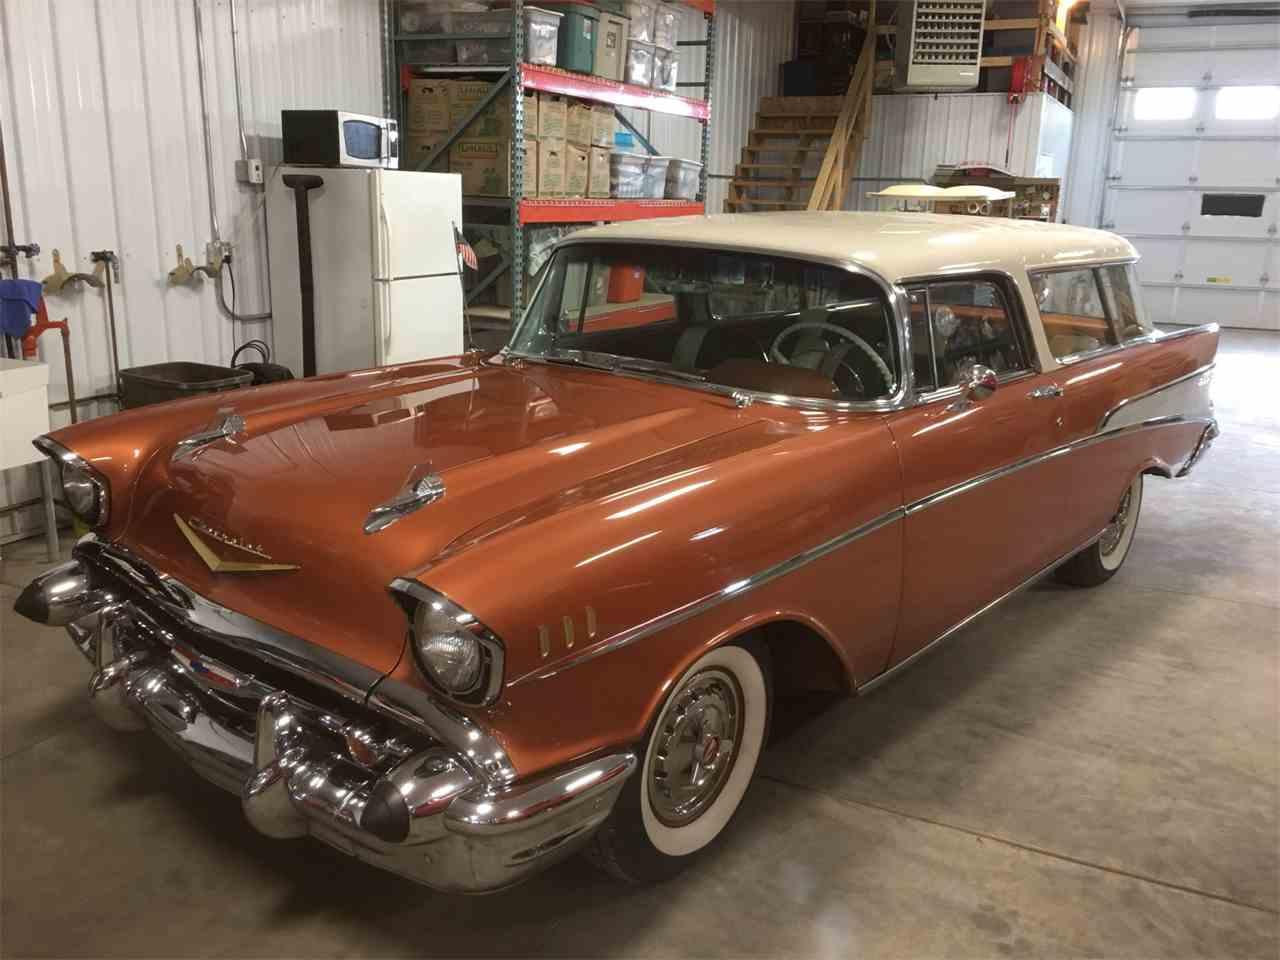 1957 Chevrolet Nomad for Sale | ClassicCars.com | CC-1111727